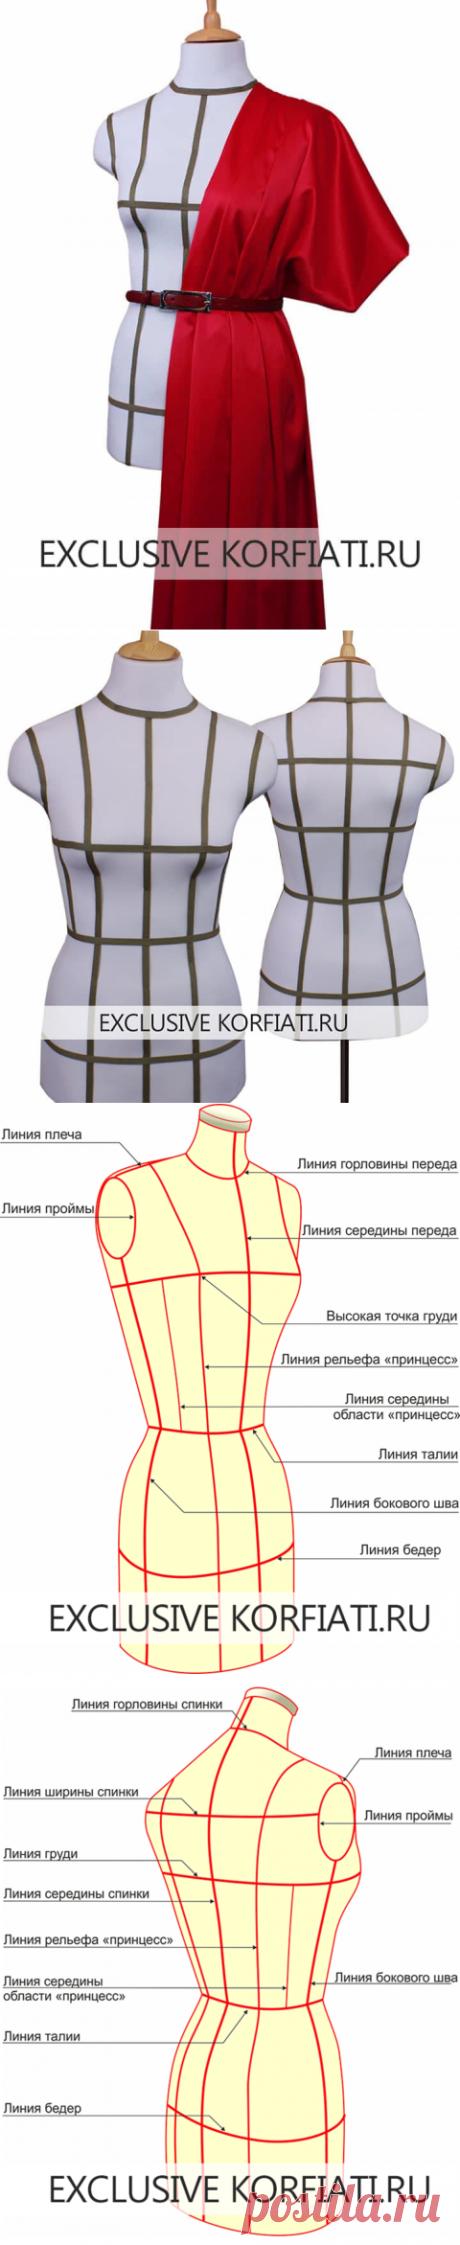 Как нанести на манекен базовую сетку - мастер-класс Анастасии Корфиати